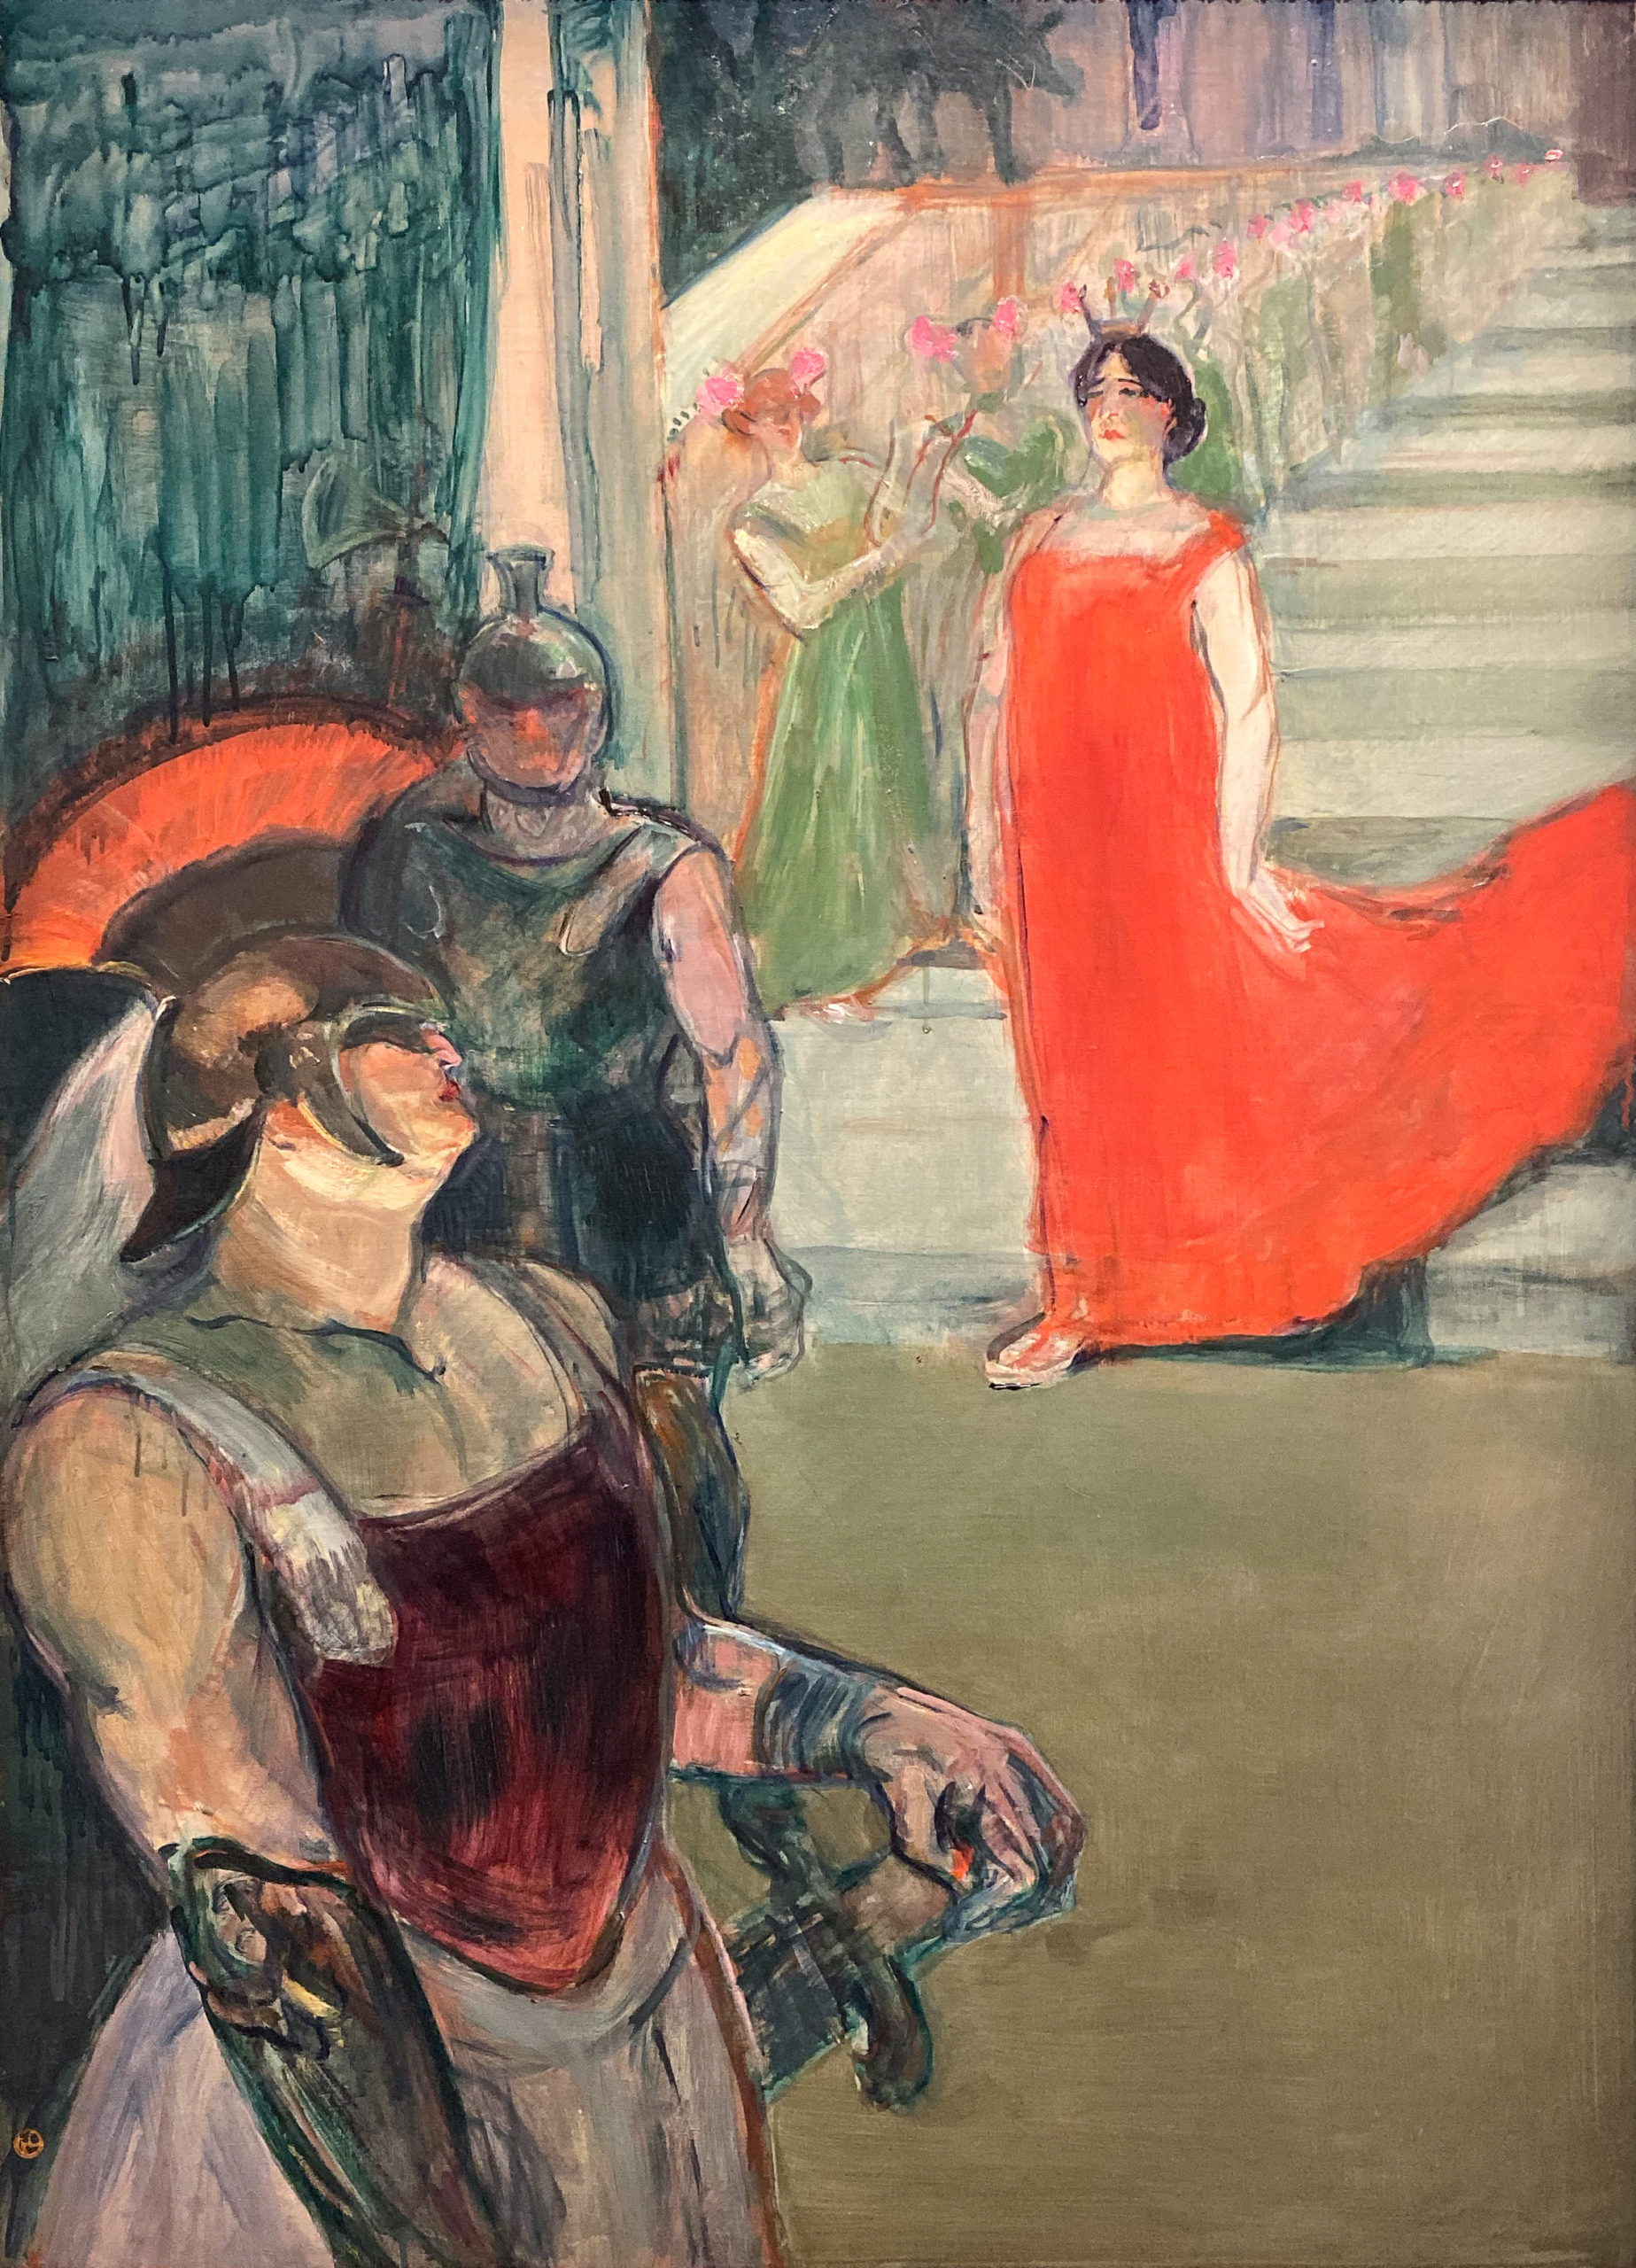 Toulouse-Lautrec im Grand Palais 2019/20 Messalina